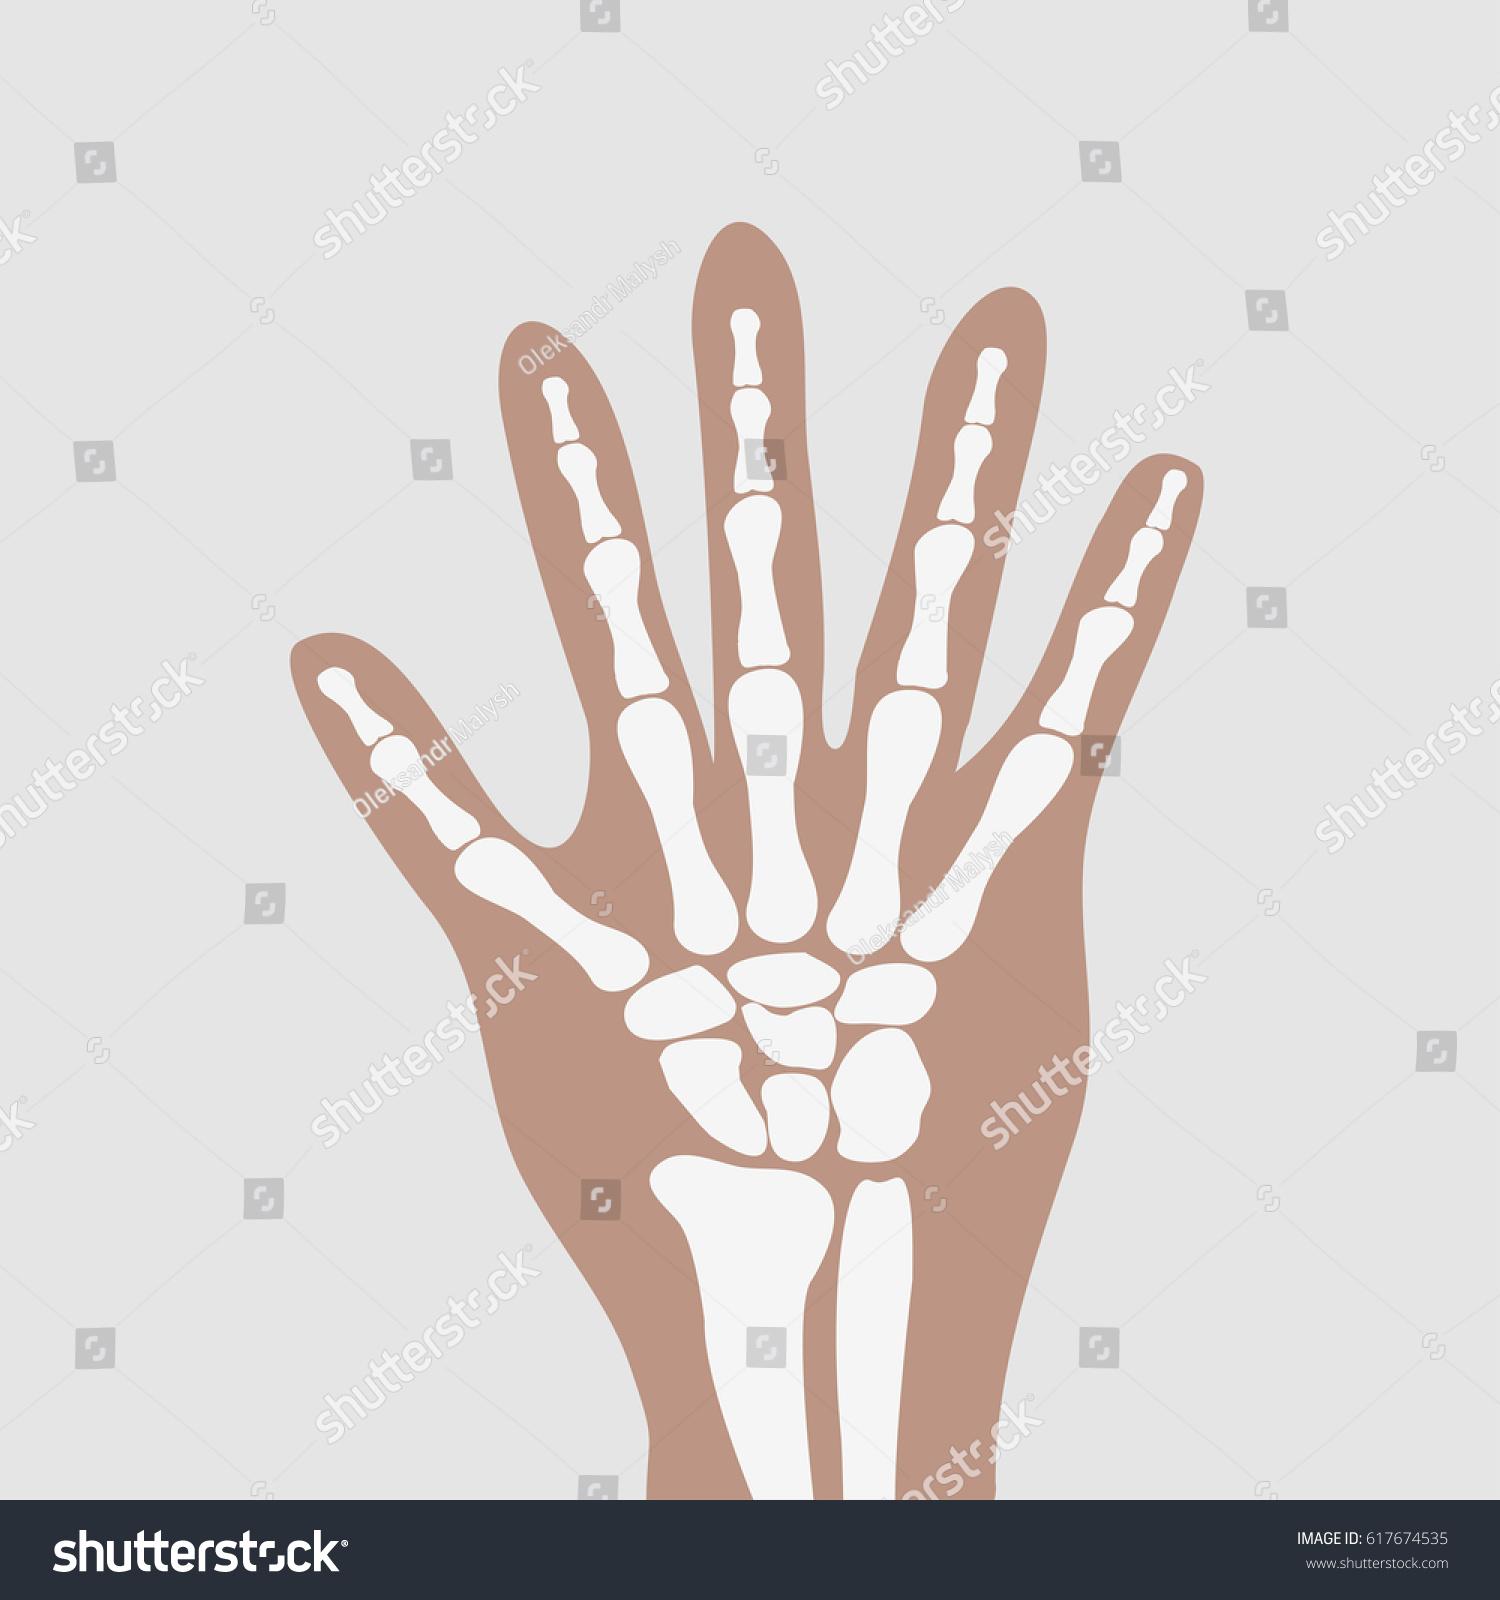 Human Wrist Hands Bones Stock Illustration 617674535 - Shutterstock